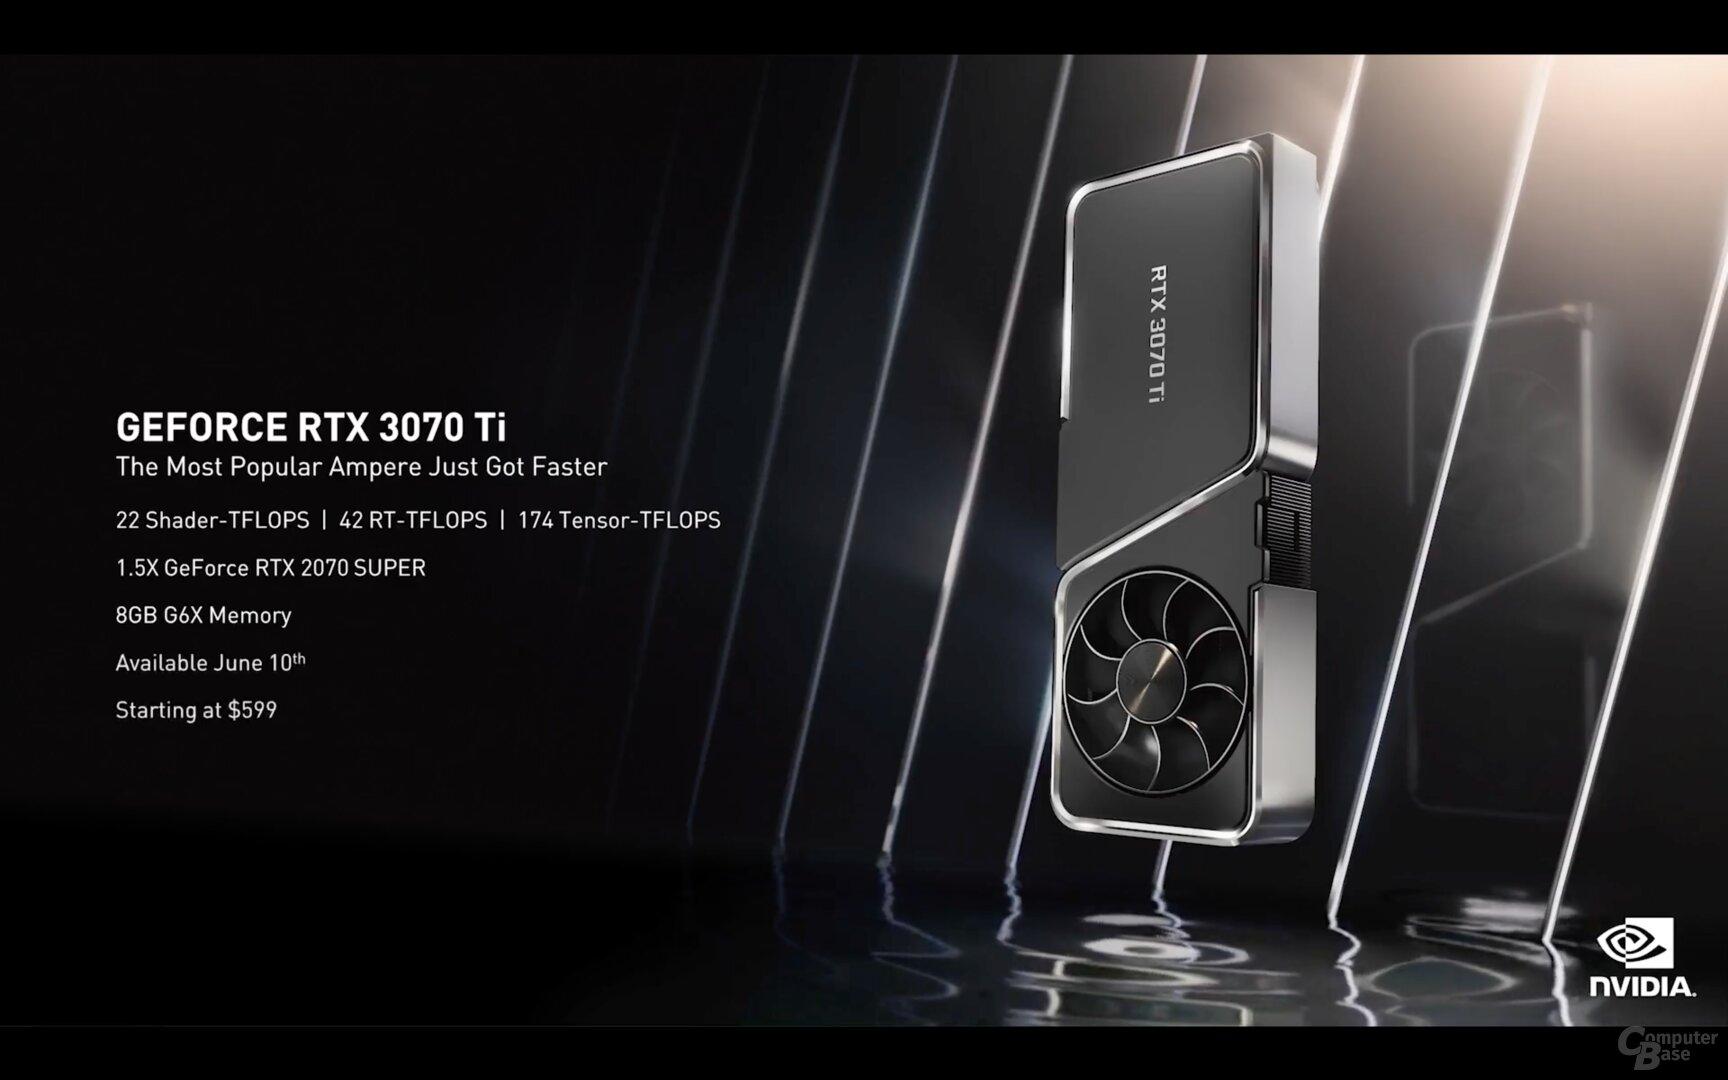 La nueva Nvidia GeForce RTX 3070 Ti